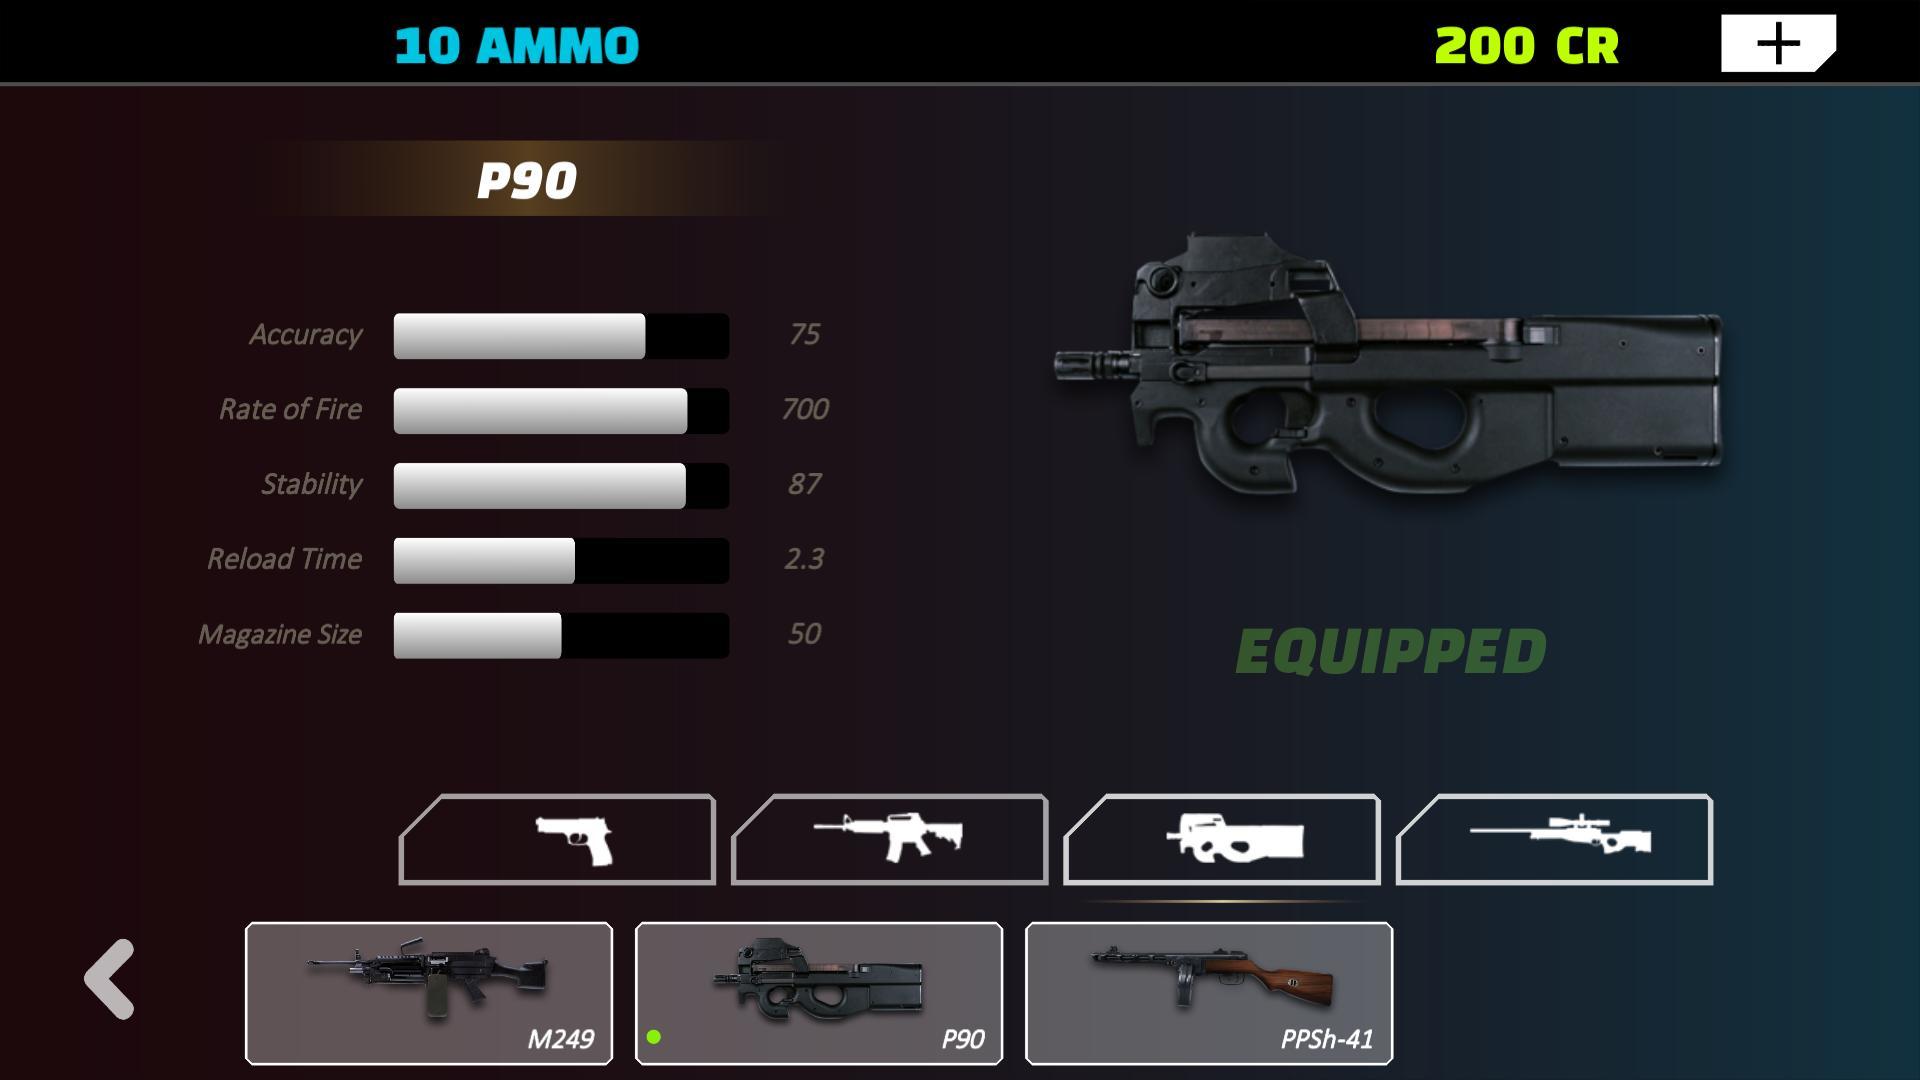 Canyon Shooting 2 - Free Shooting Range 3.0.6 Screenshot 4